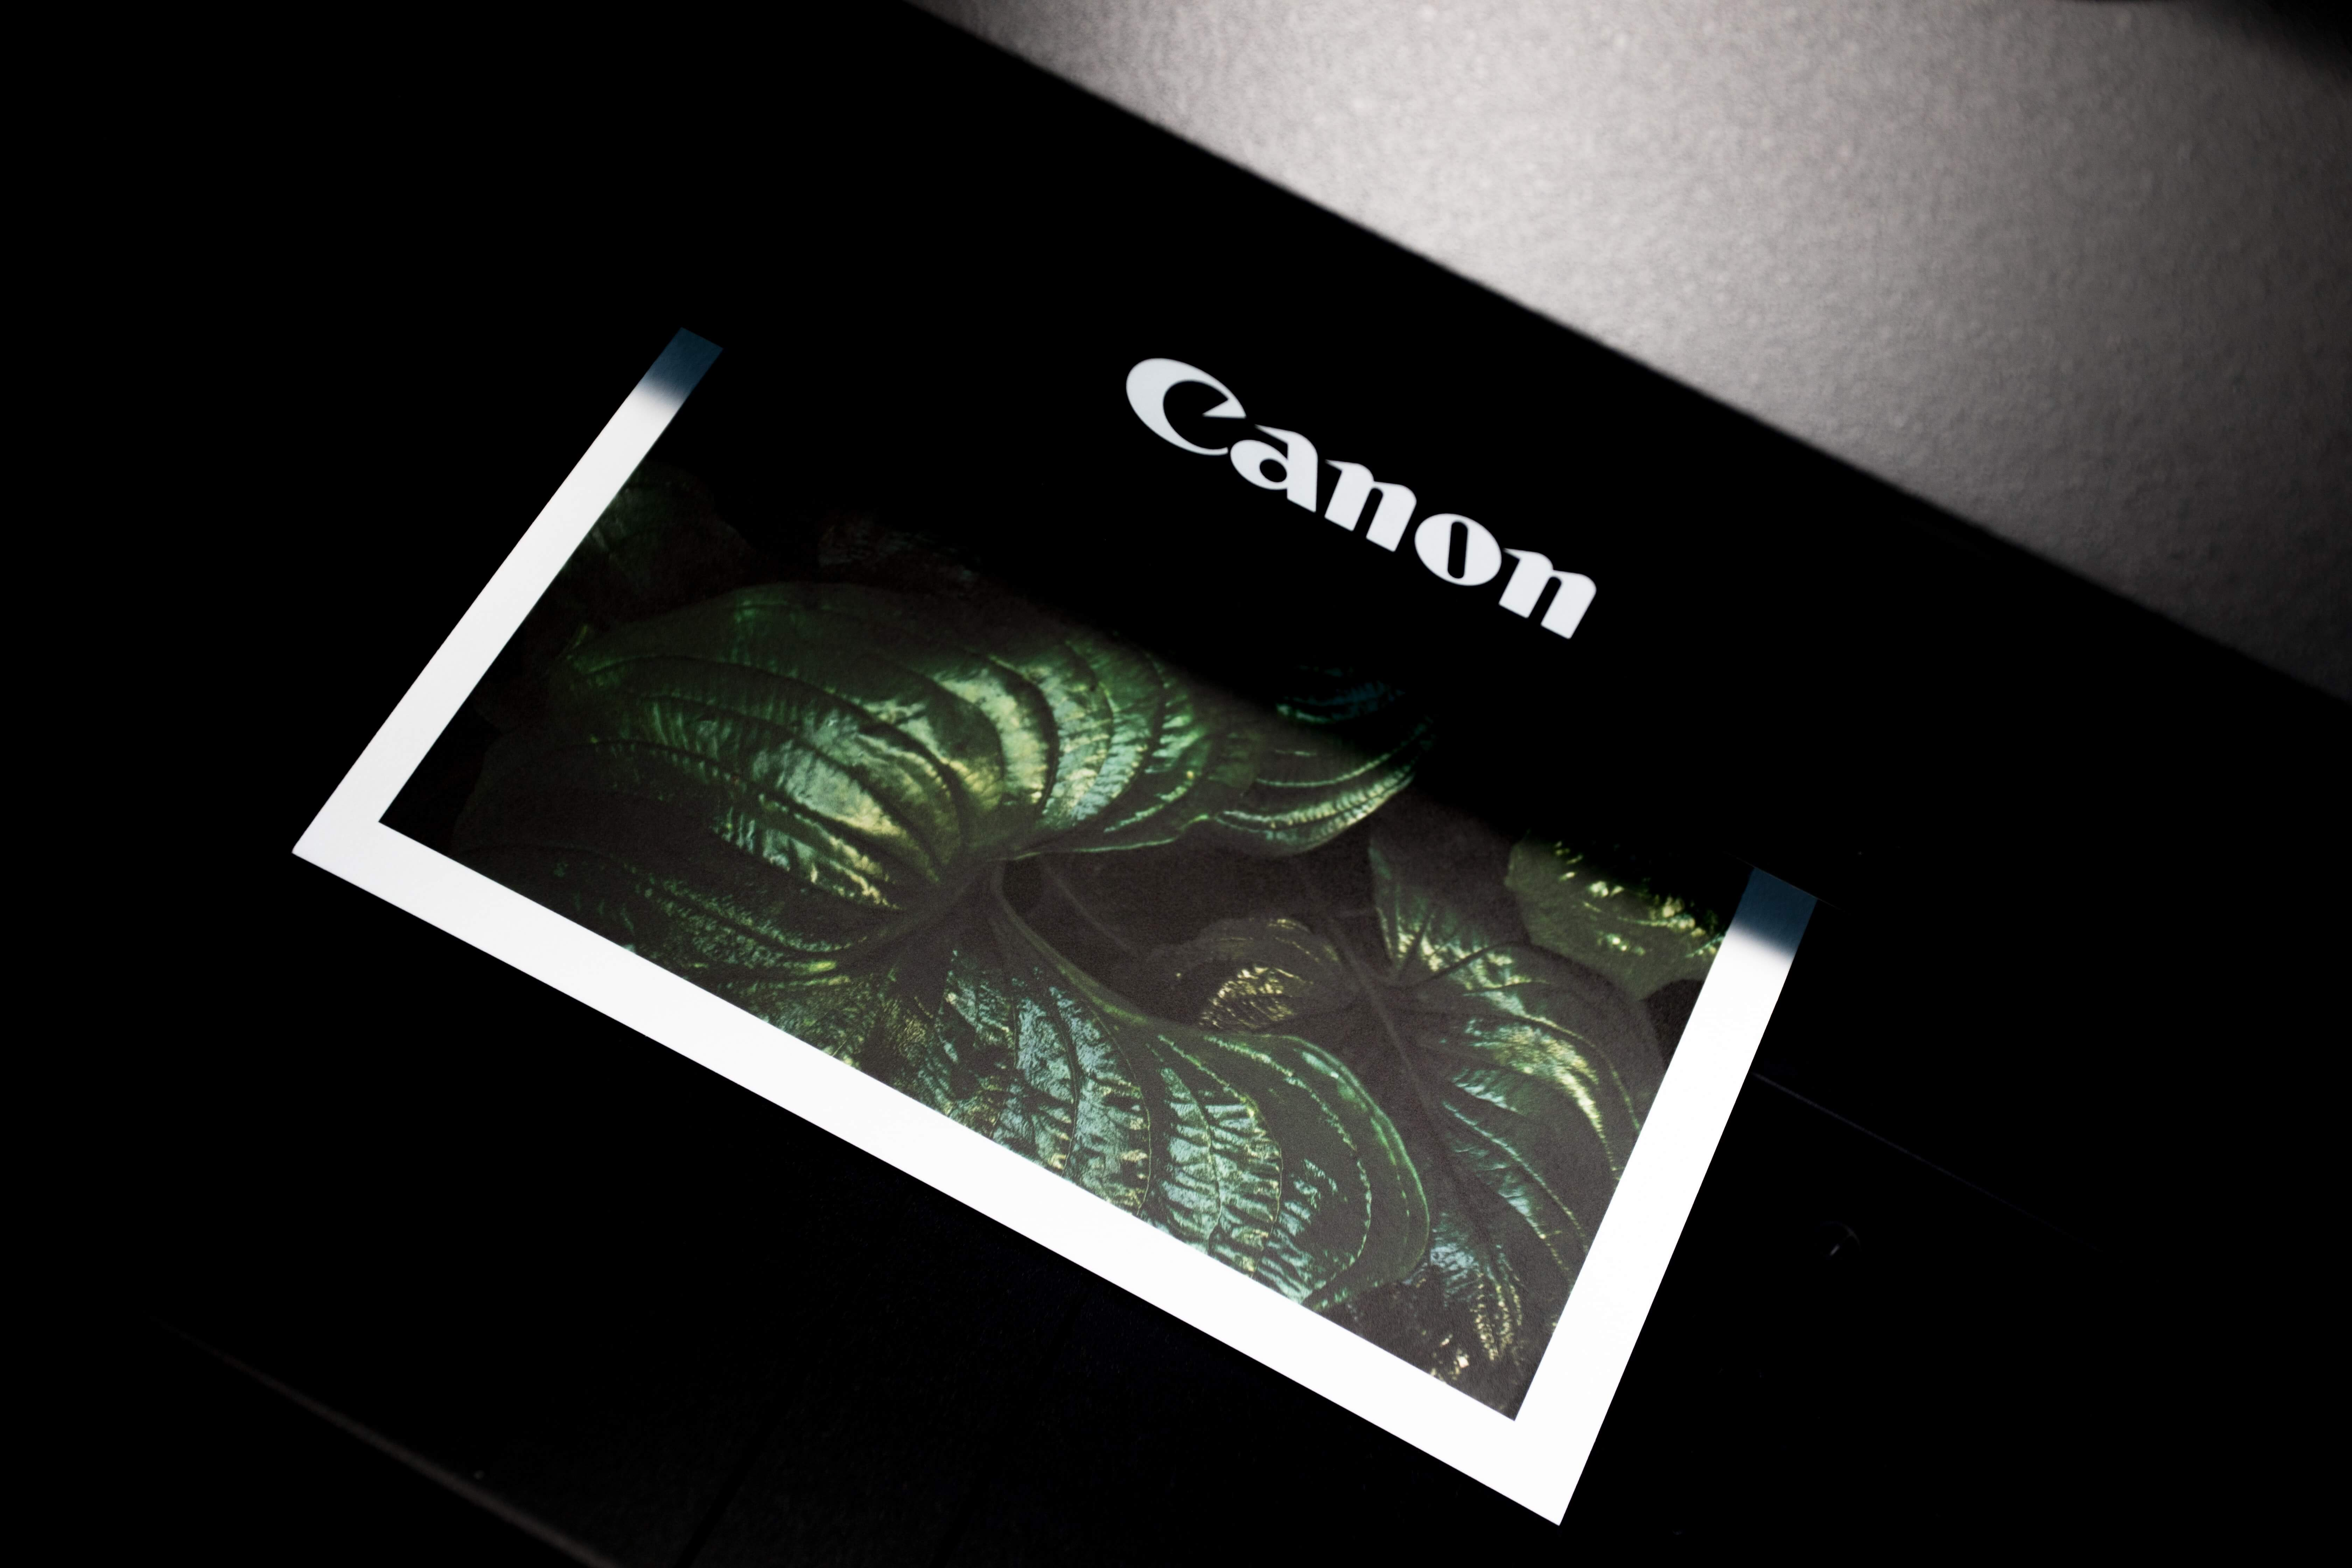 canon printeris